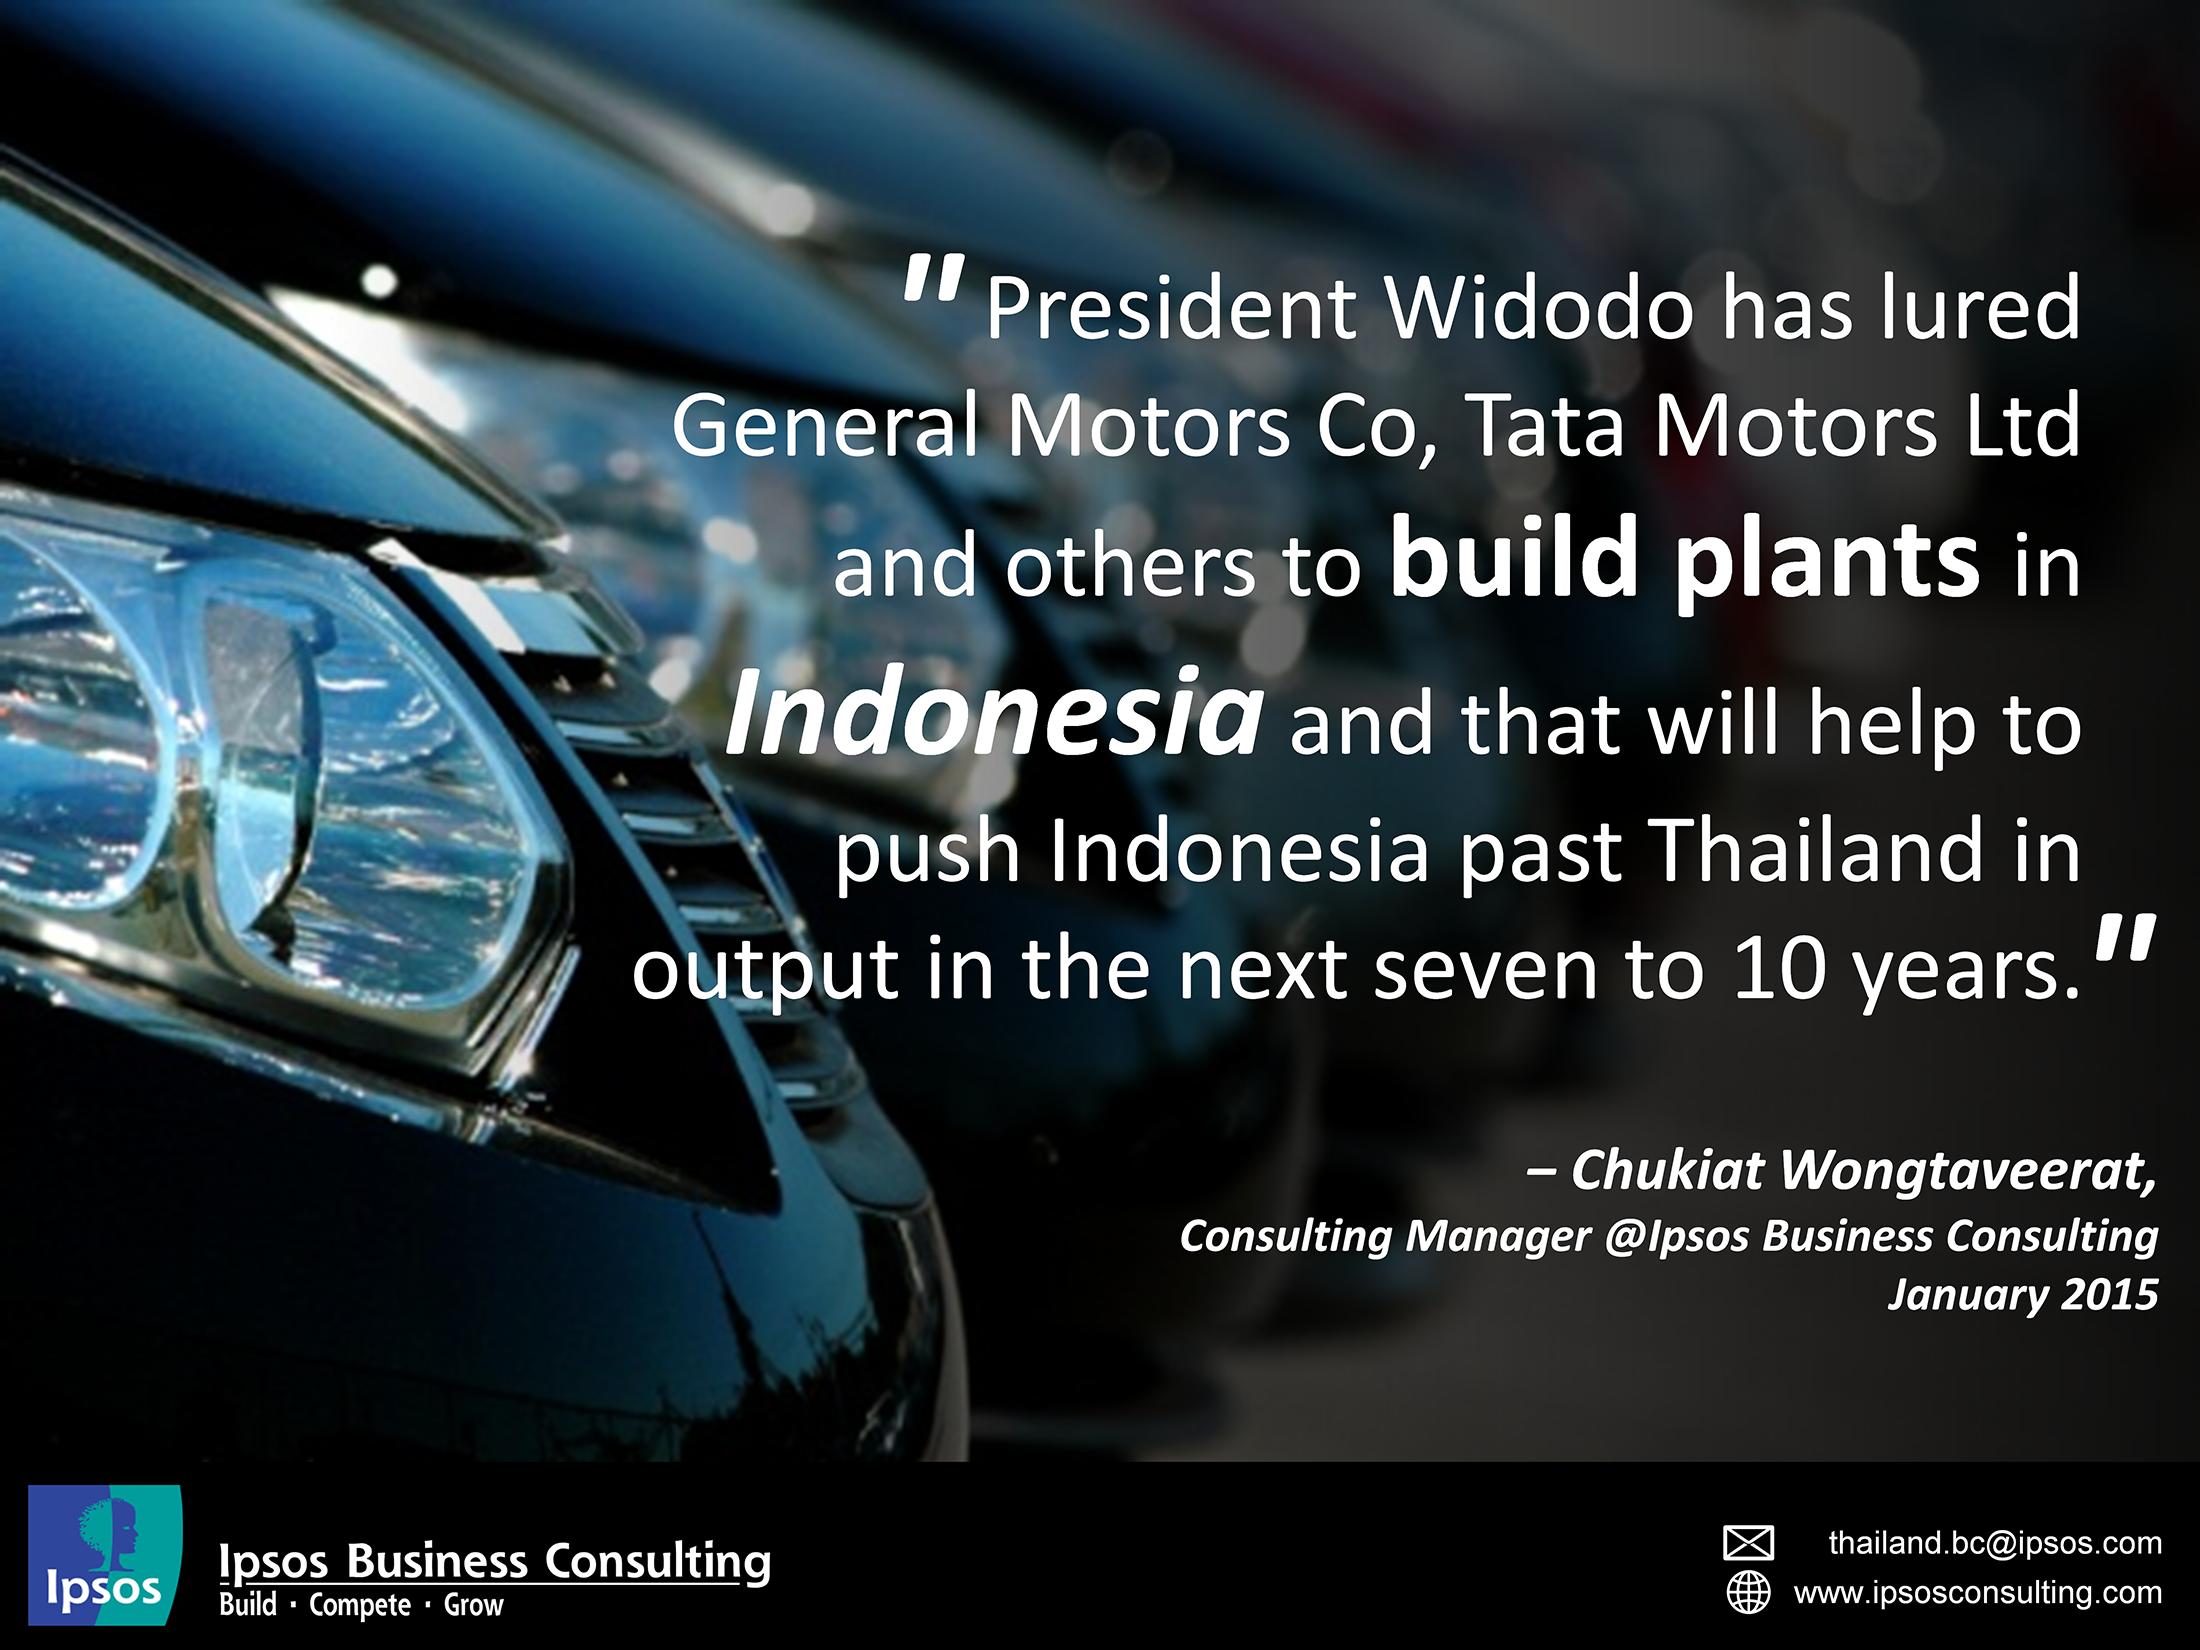 Indonesia set to take Regional Crown! Read what Chukiat